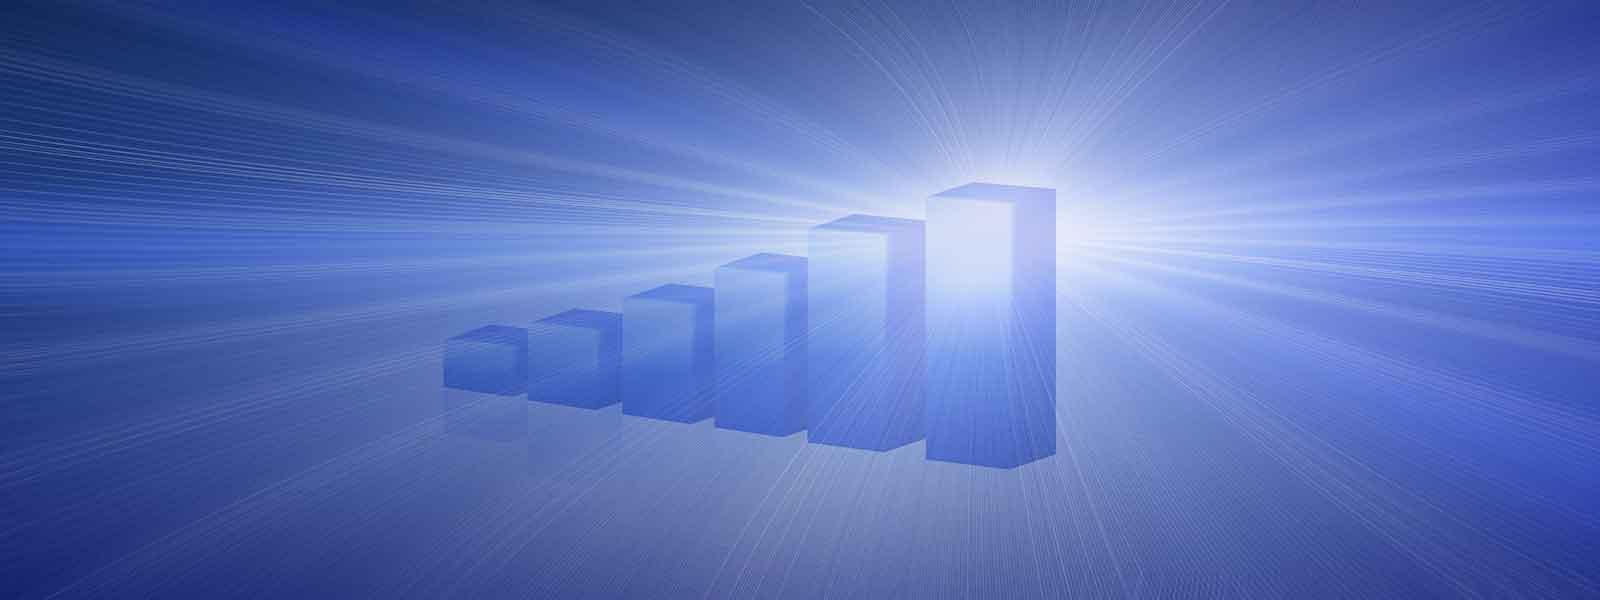 Veritec Revolutionizes Self Storage Pricing